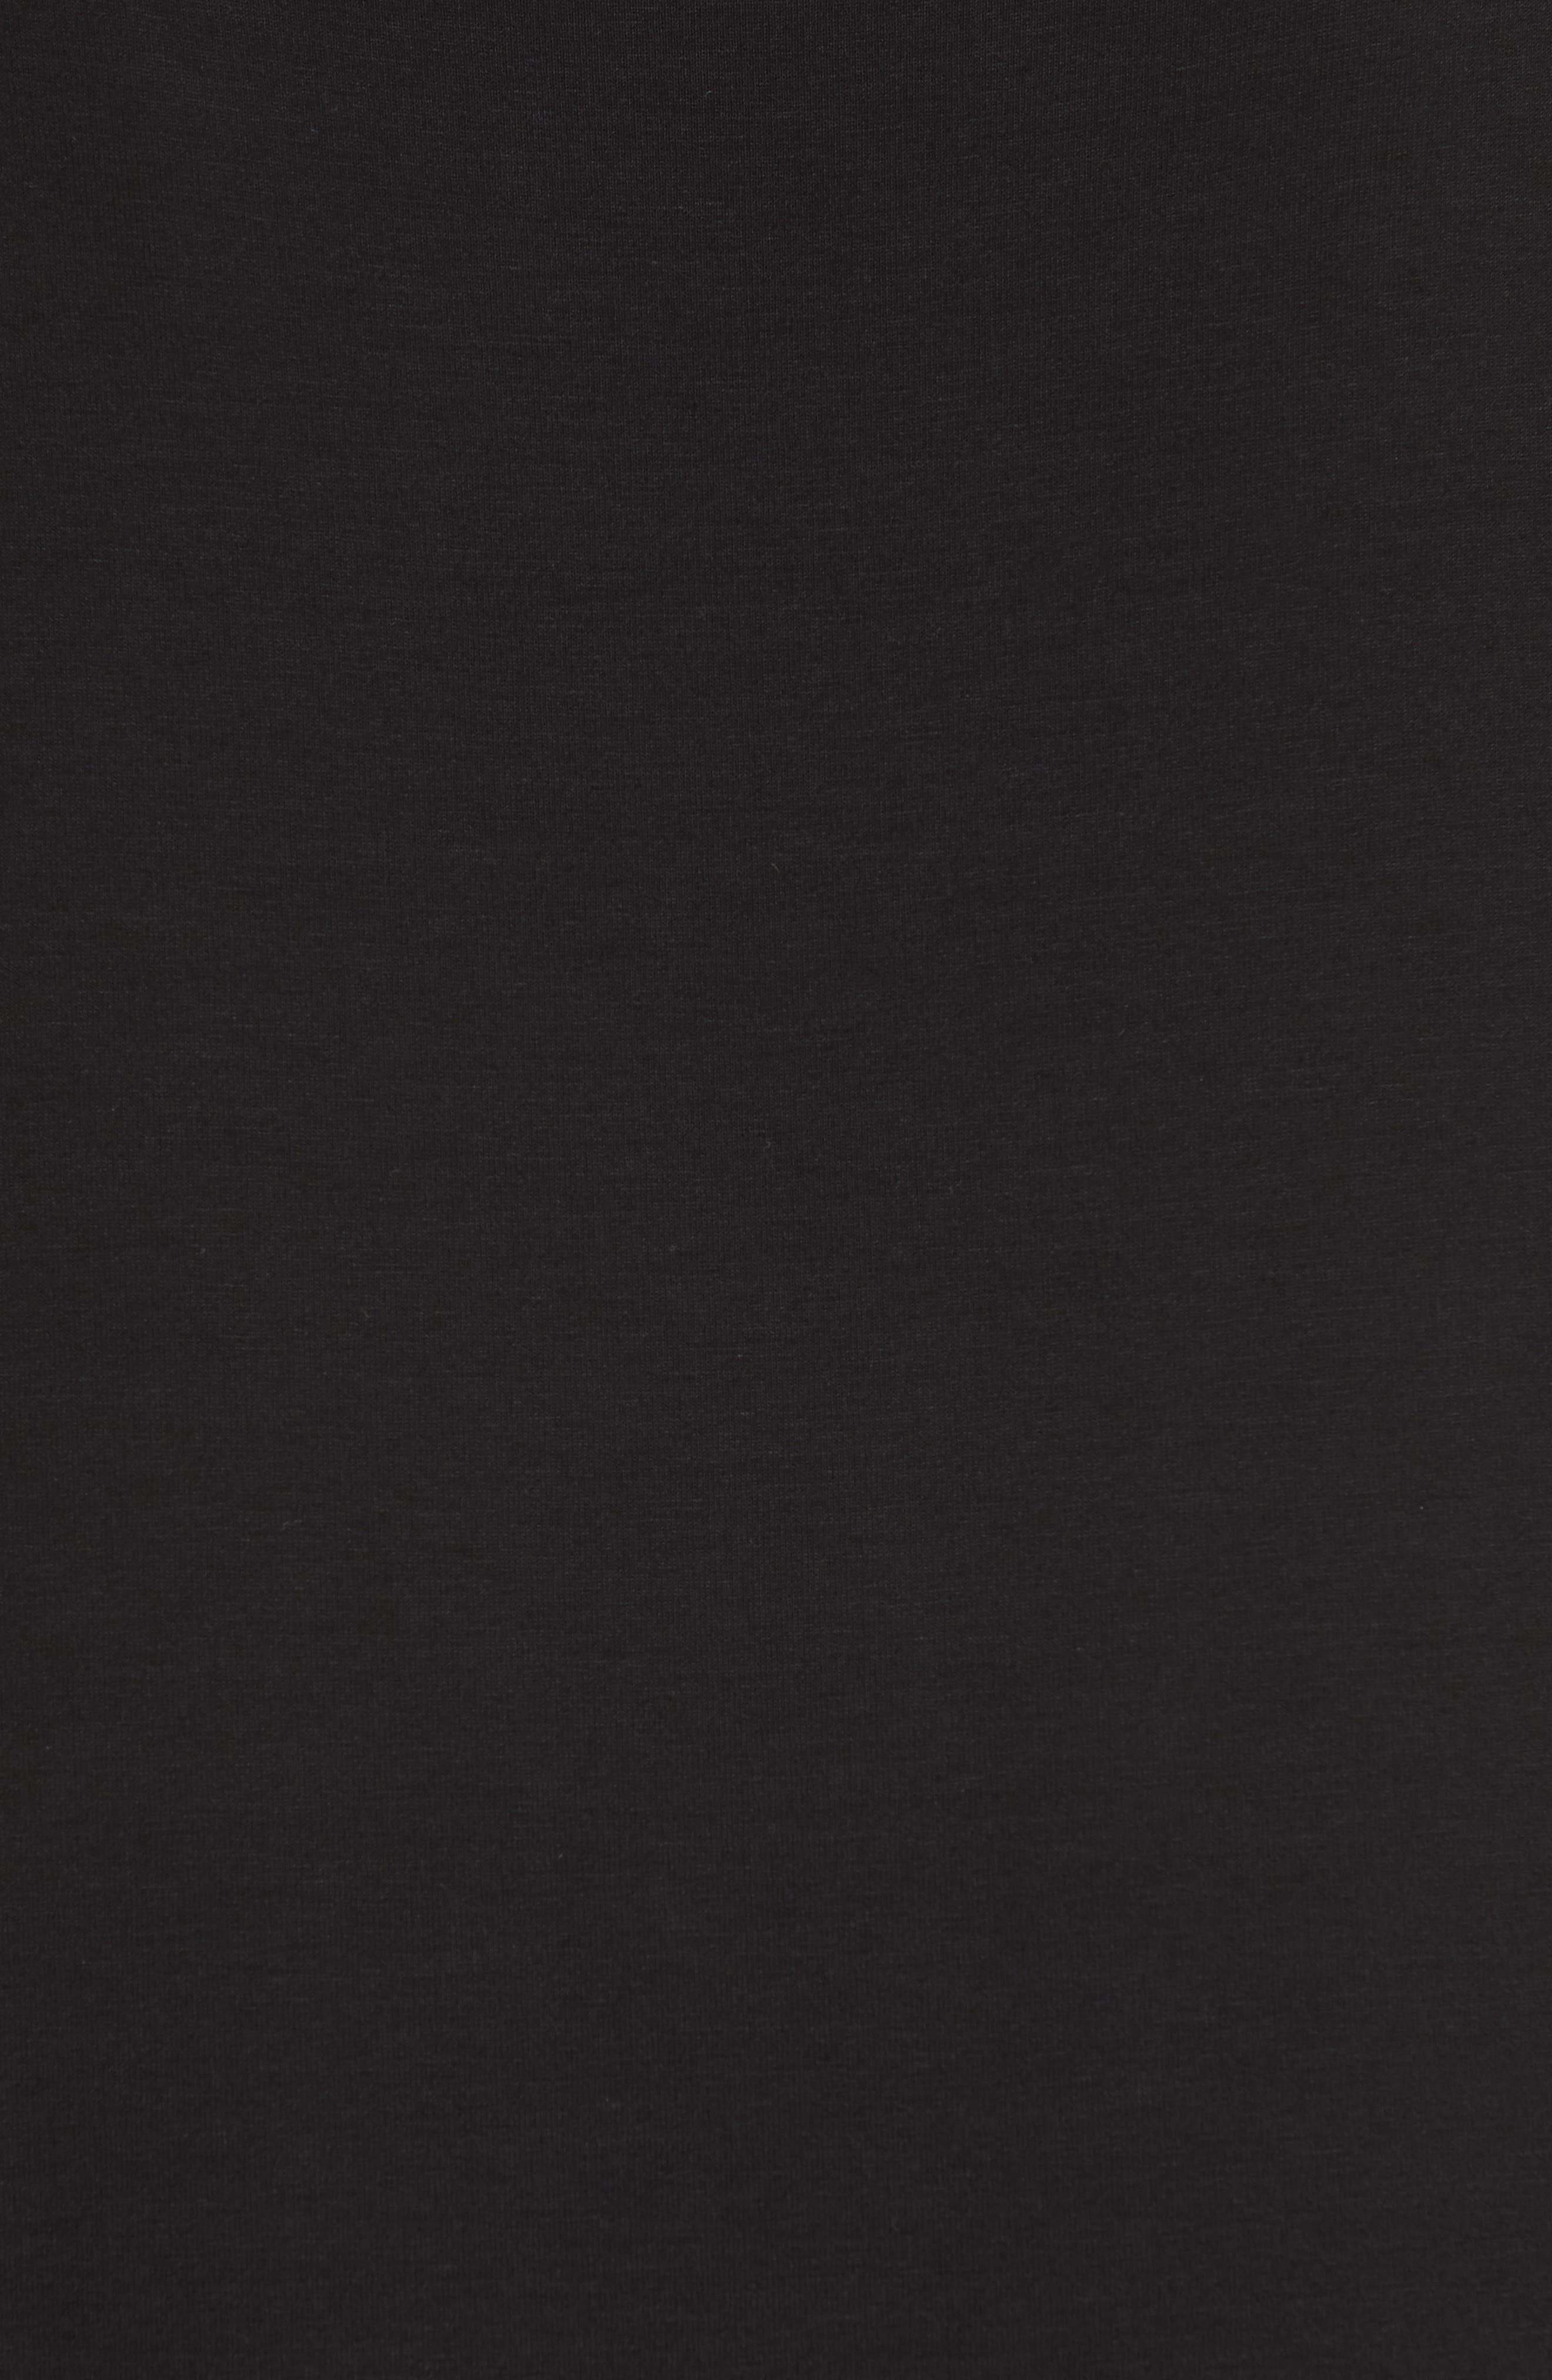 Cami Dress,                             Alternate thumbnail 3, color,                             Black